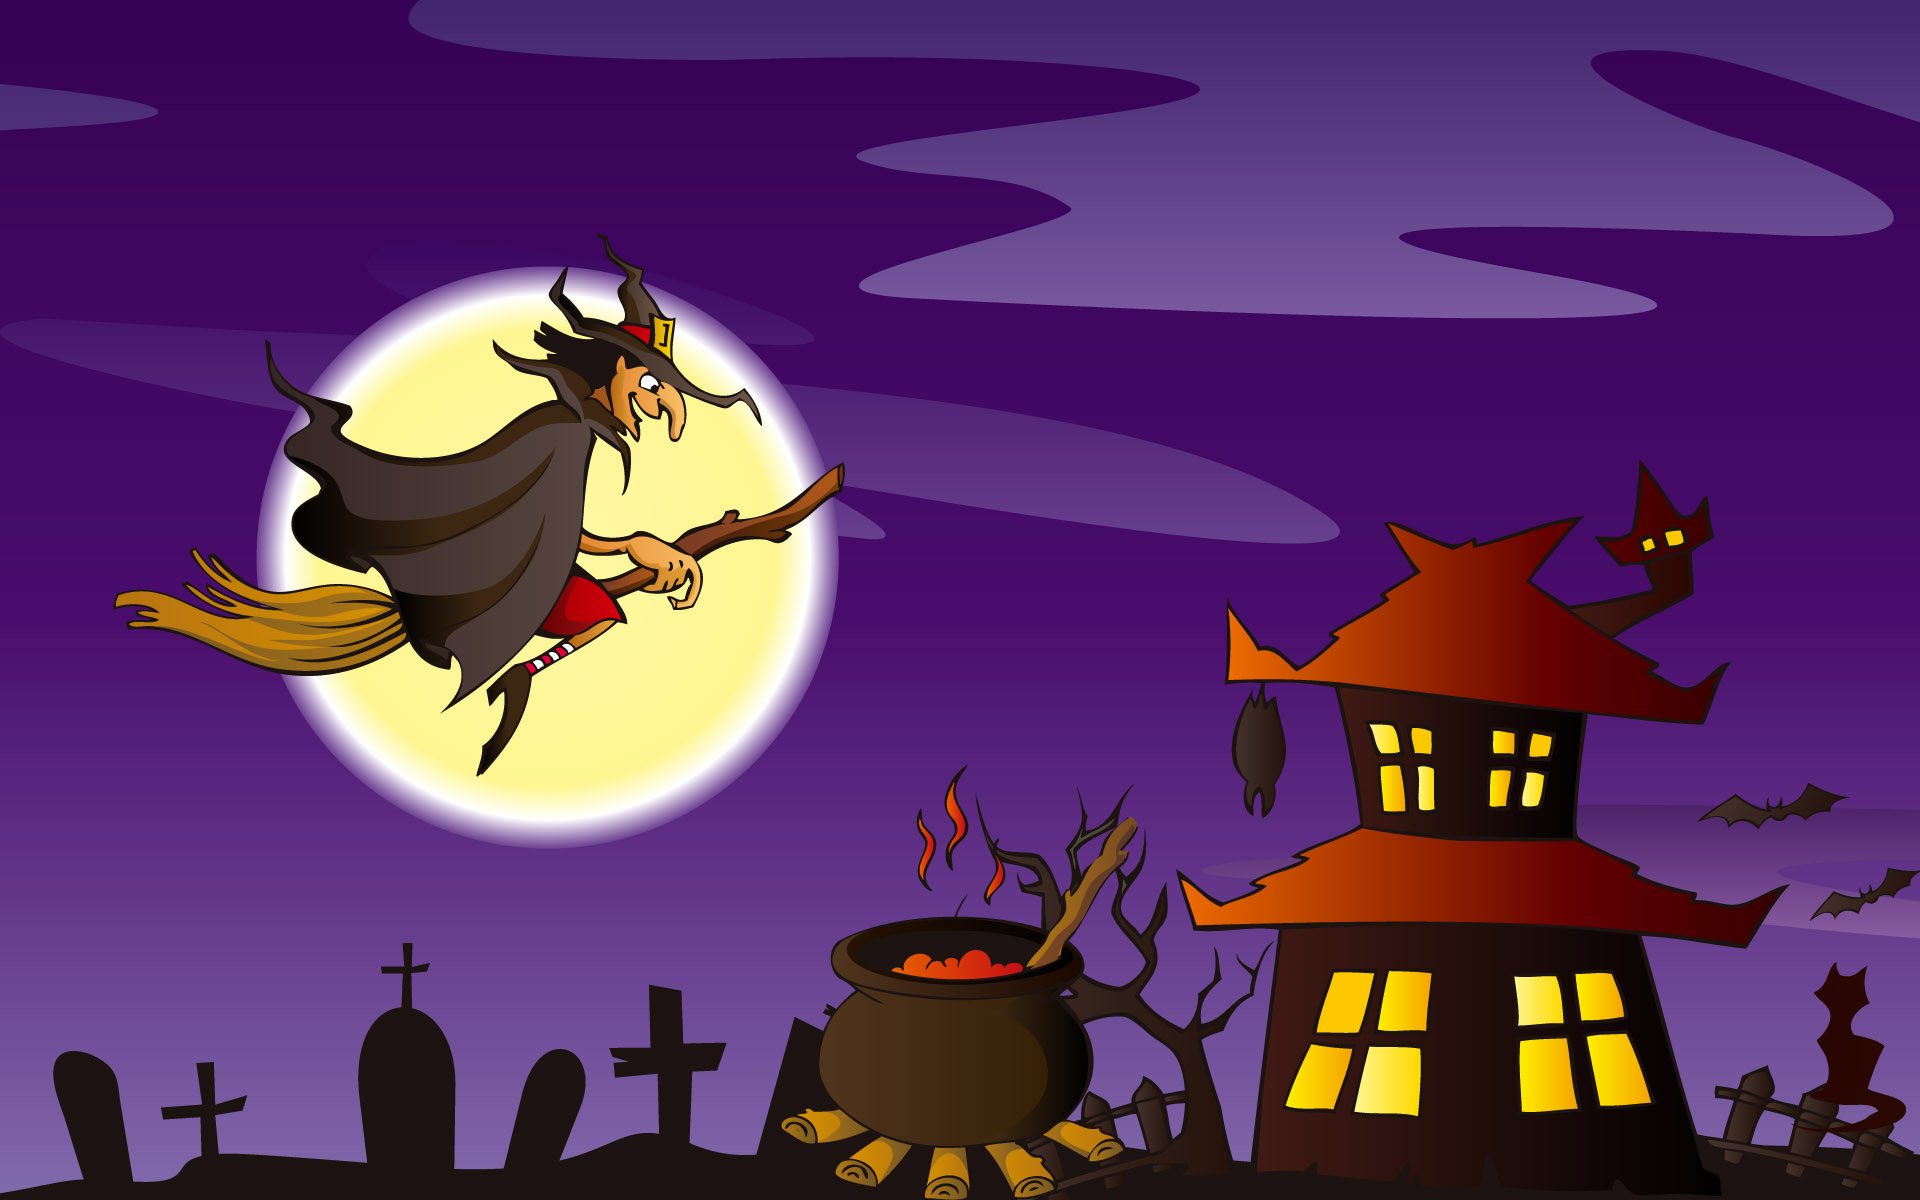 H:\Хэллоуин\gorod-hellouin.jpg